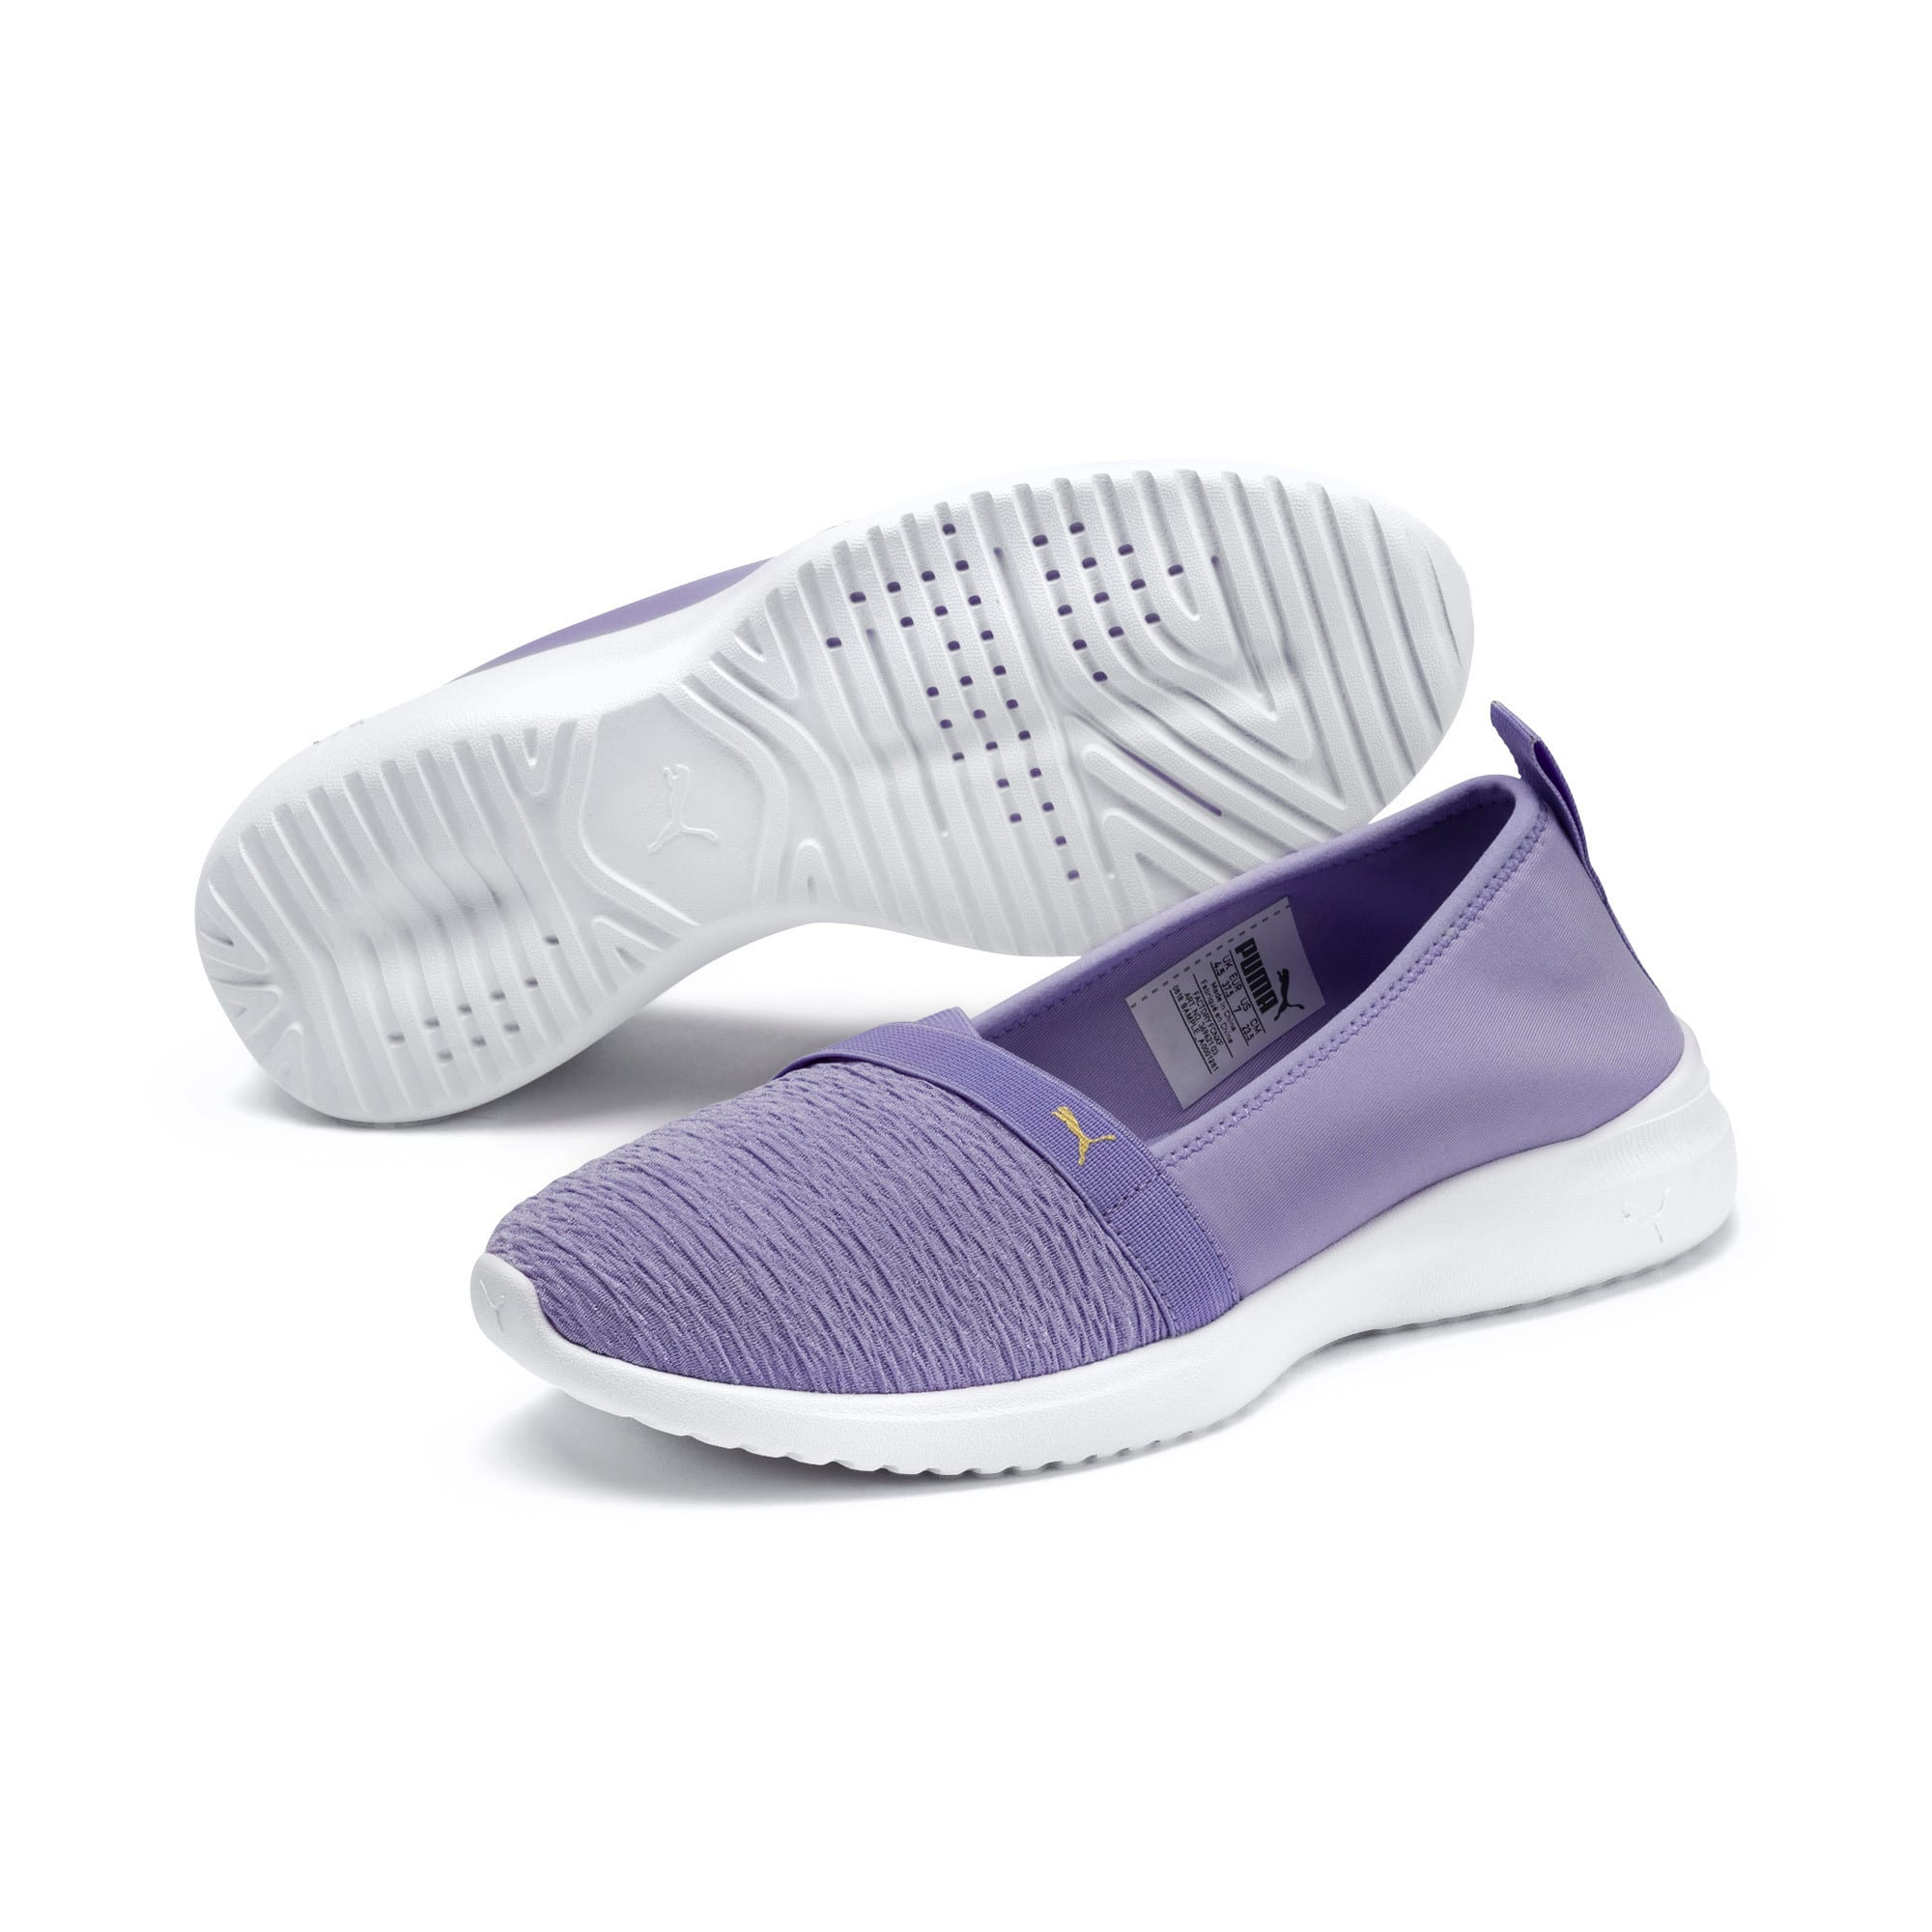 Thumbnail 2 of Adelina Women's Ballet Shoes, Sweet Lavender-Team Gold, medium